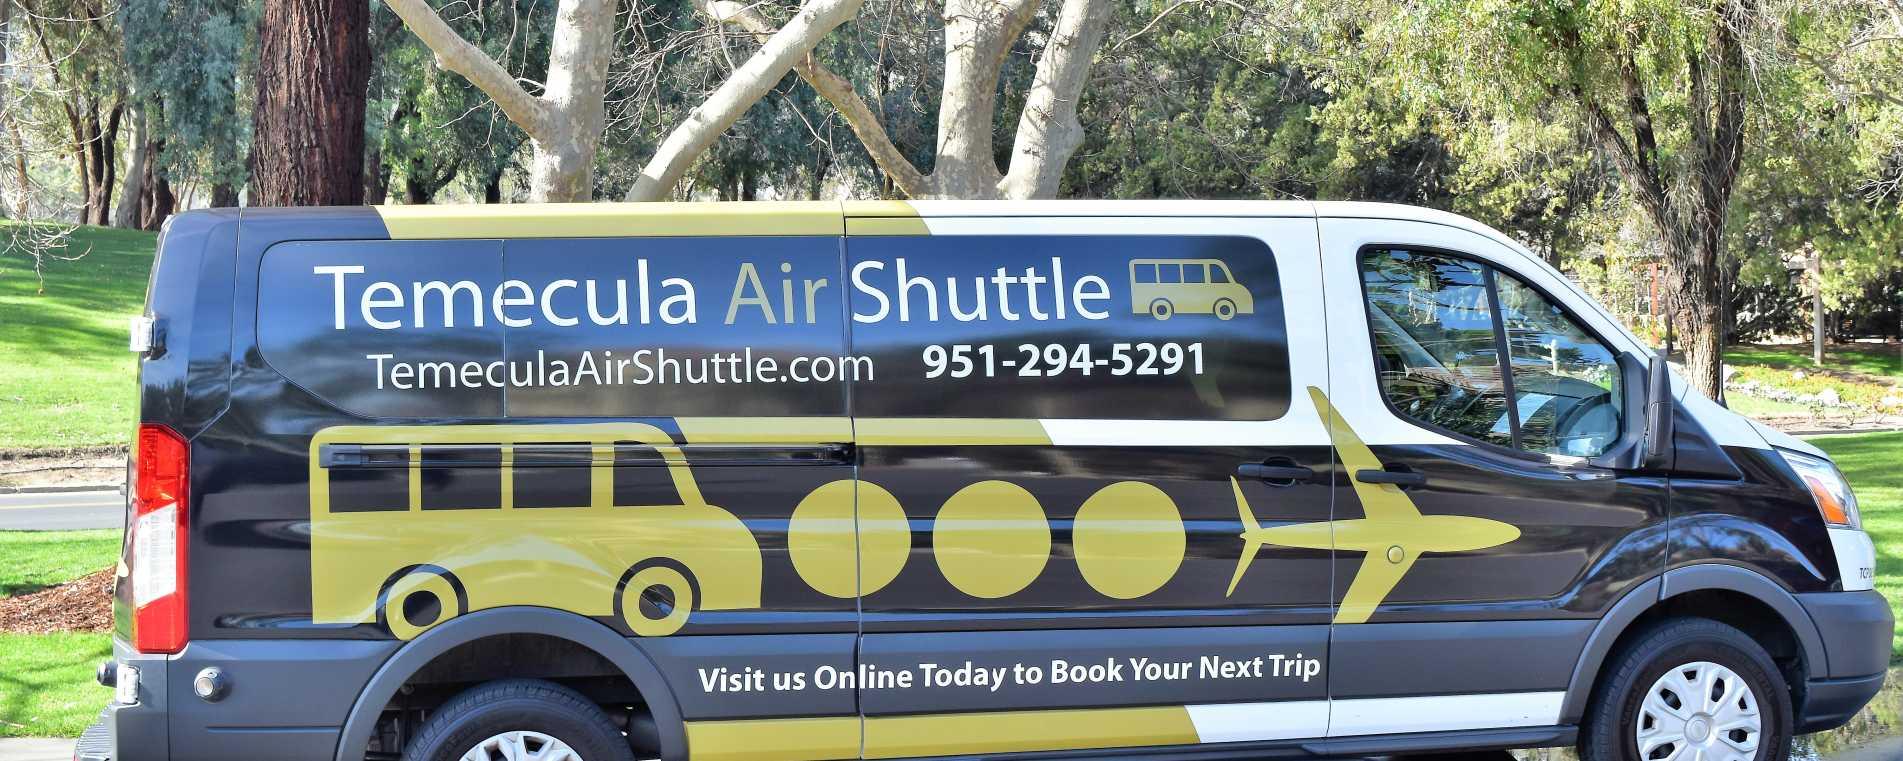 Temecula Air Shuttle Provided Image